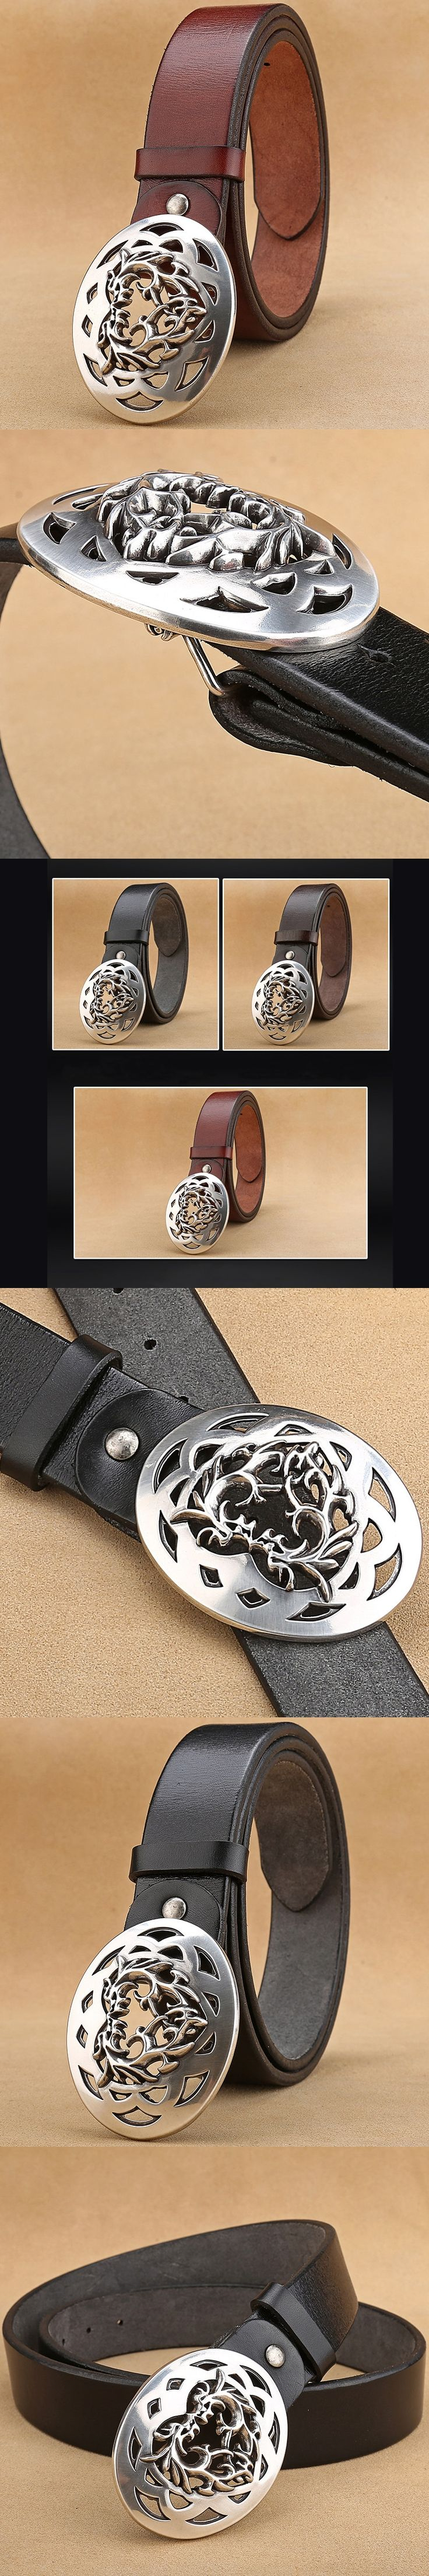 Hot Sale Top cow genuine leather designer belts mens fashion buckle Cowskin Waist Strap Black luxury famous brand Waistband